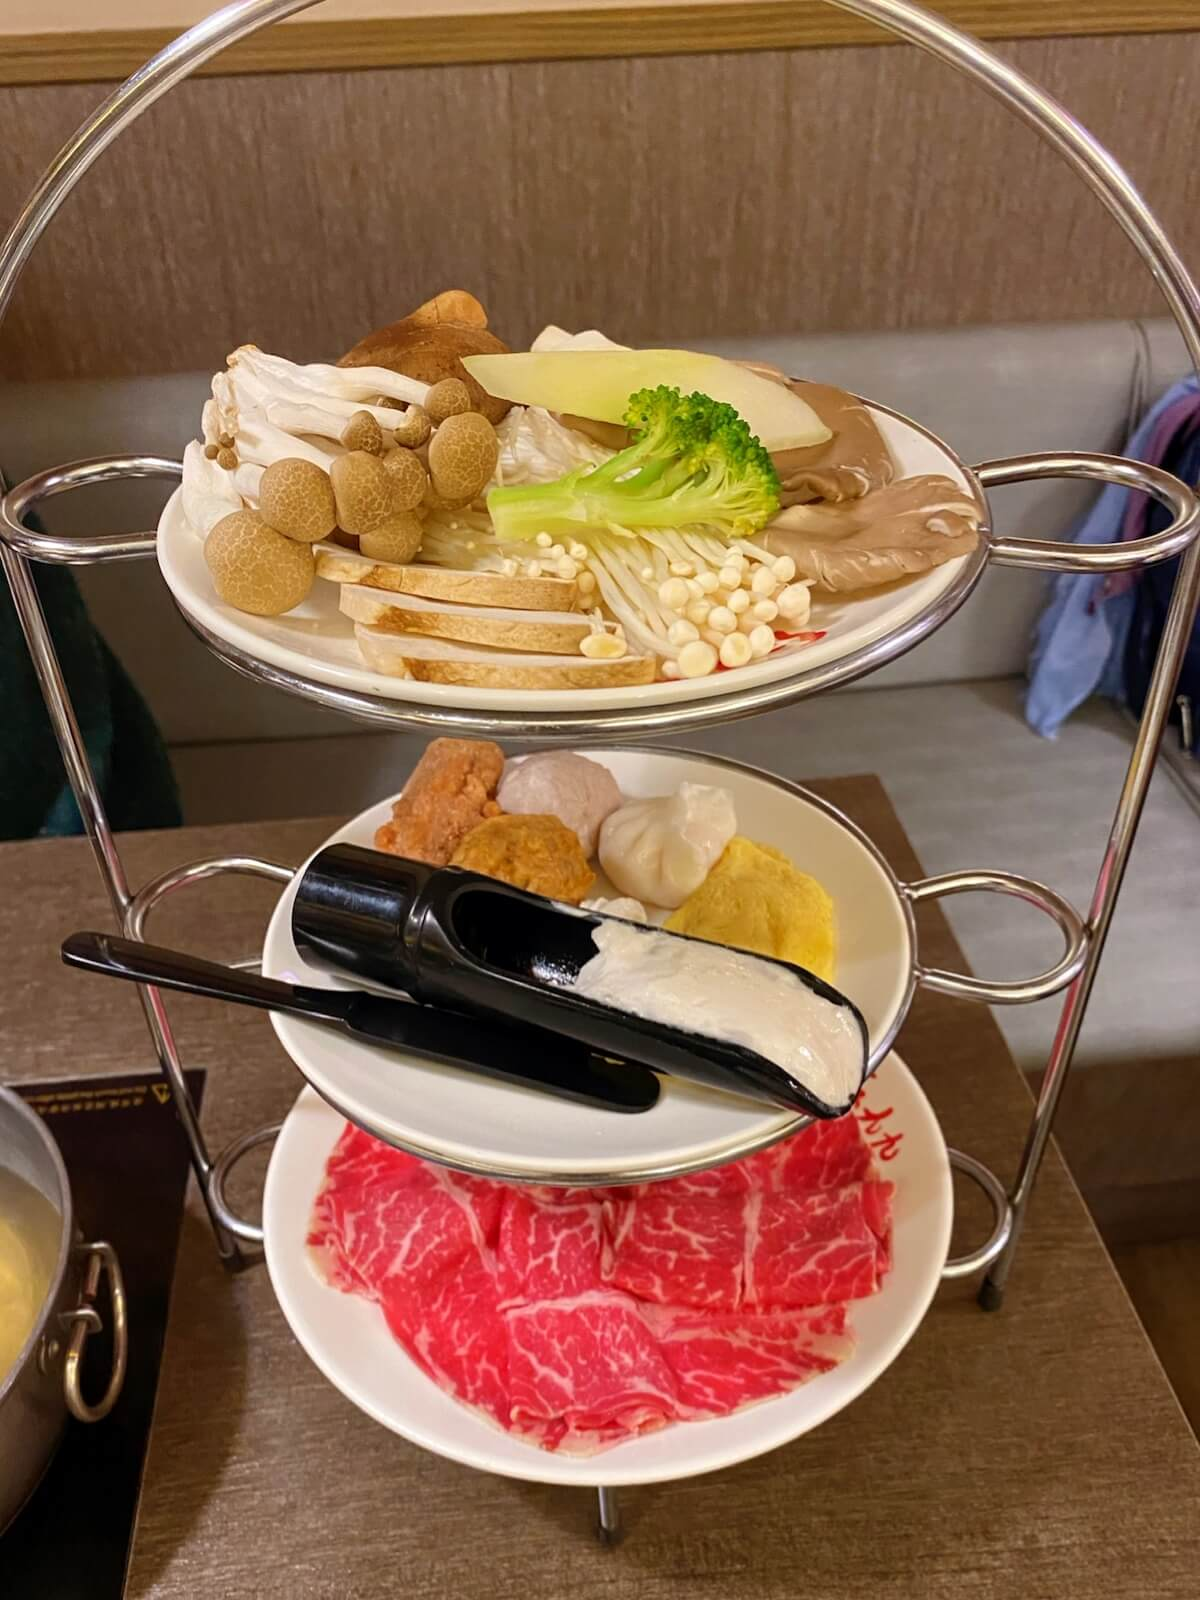 The mushroom, meatballs and chuck rib set